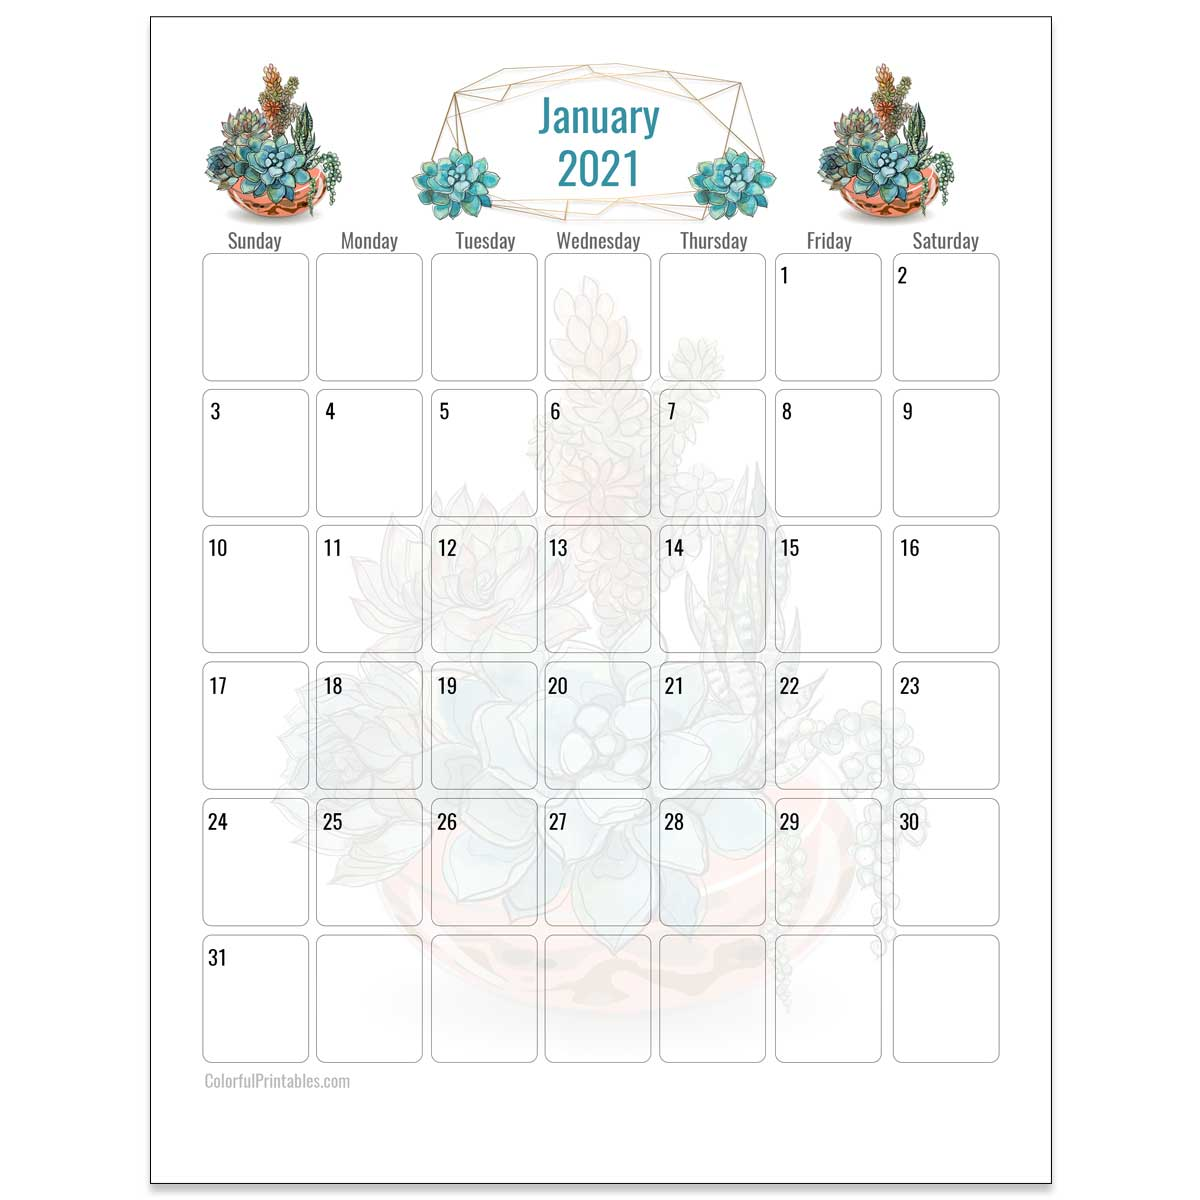 January 2021 Succulents Calendar